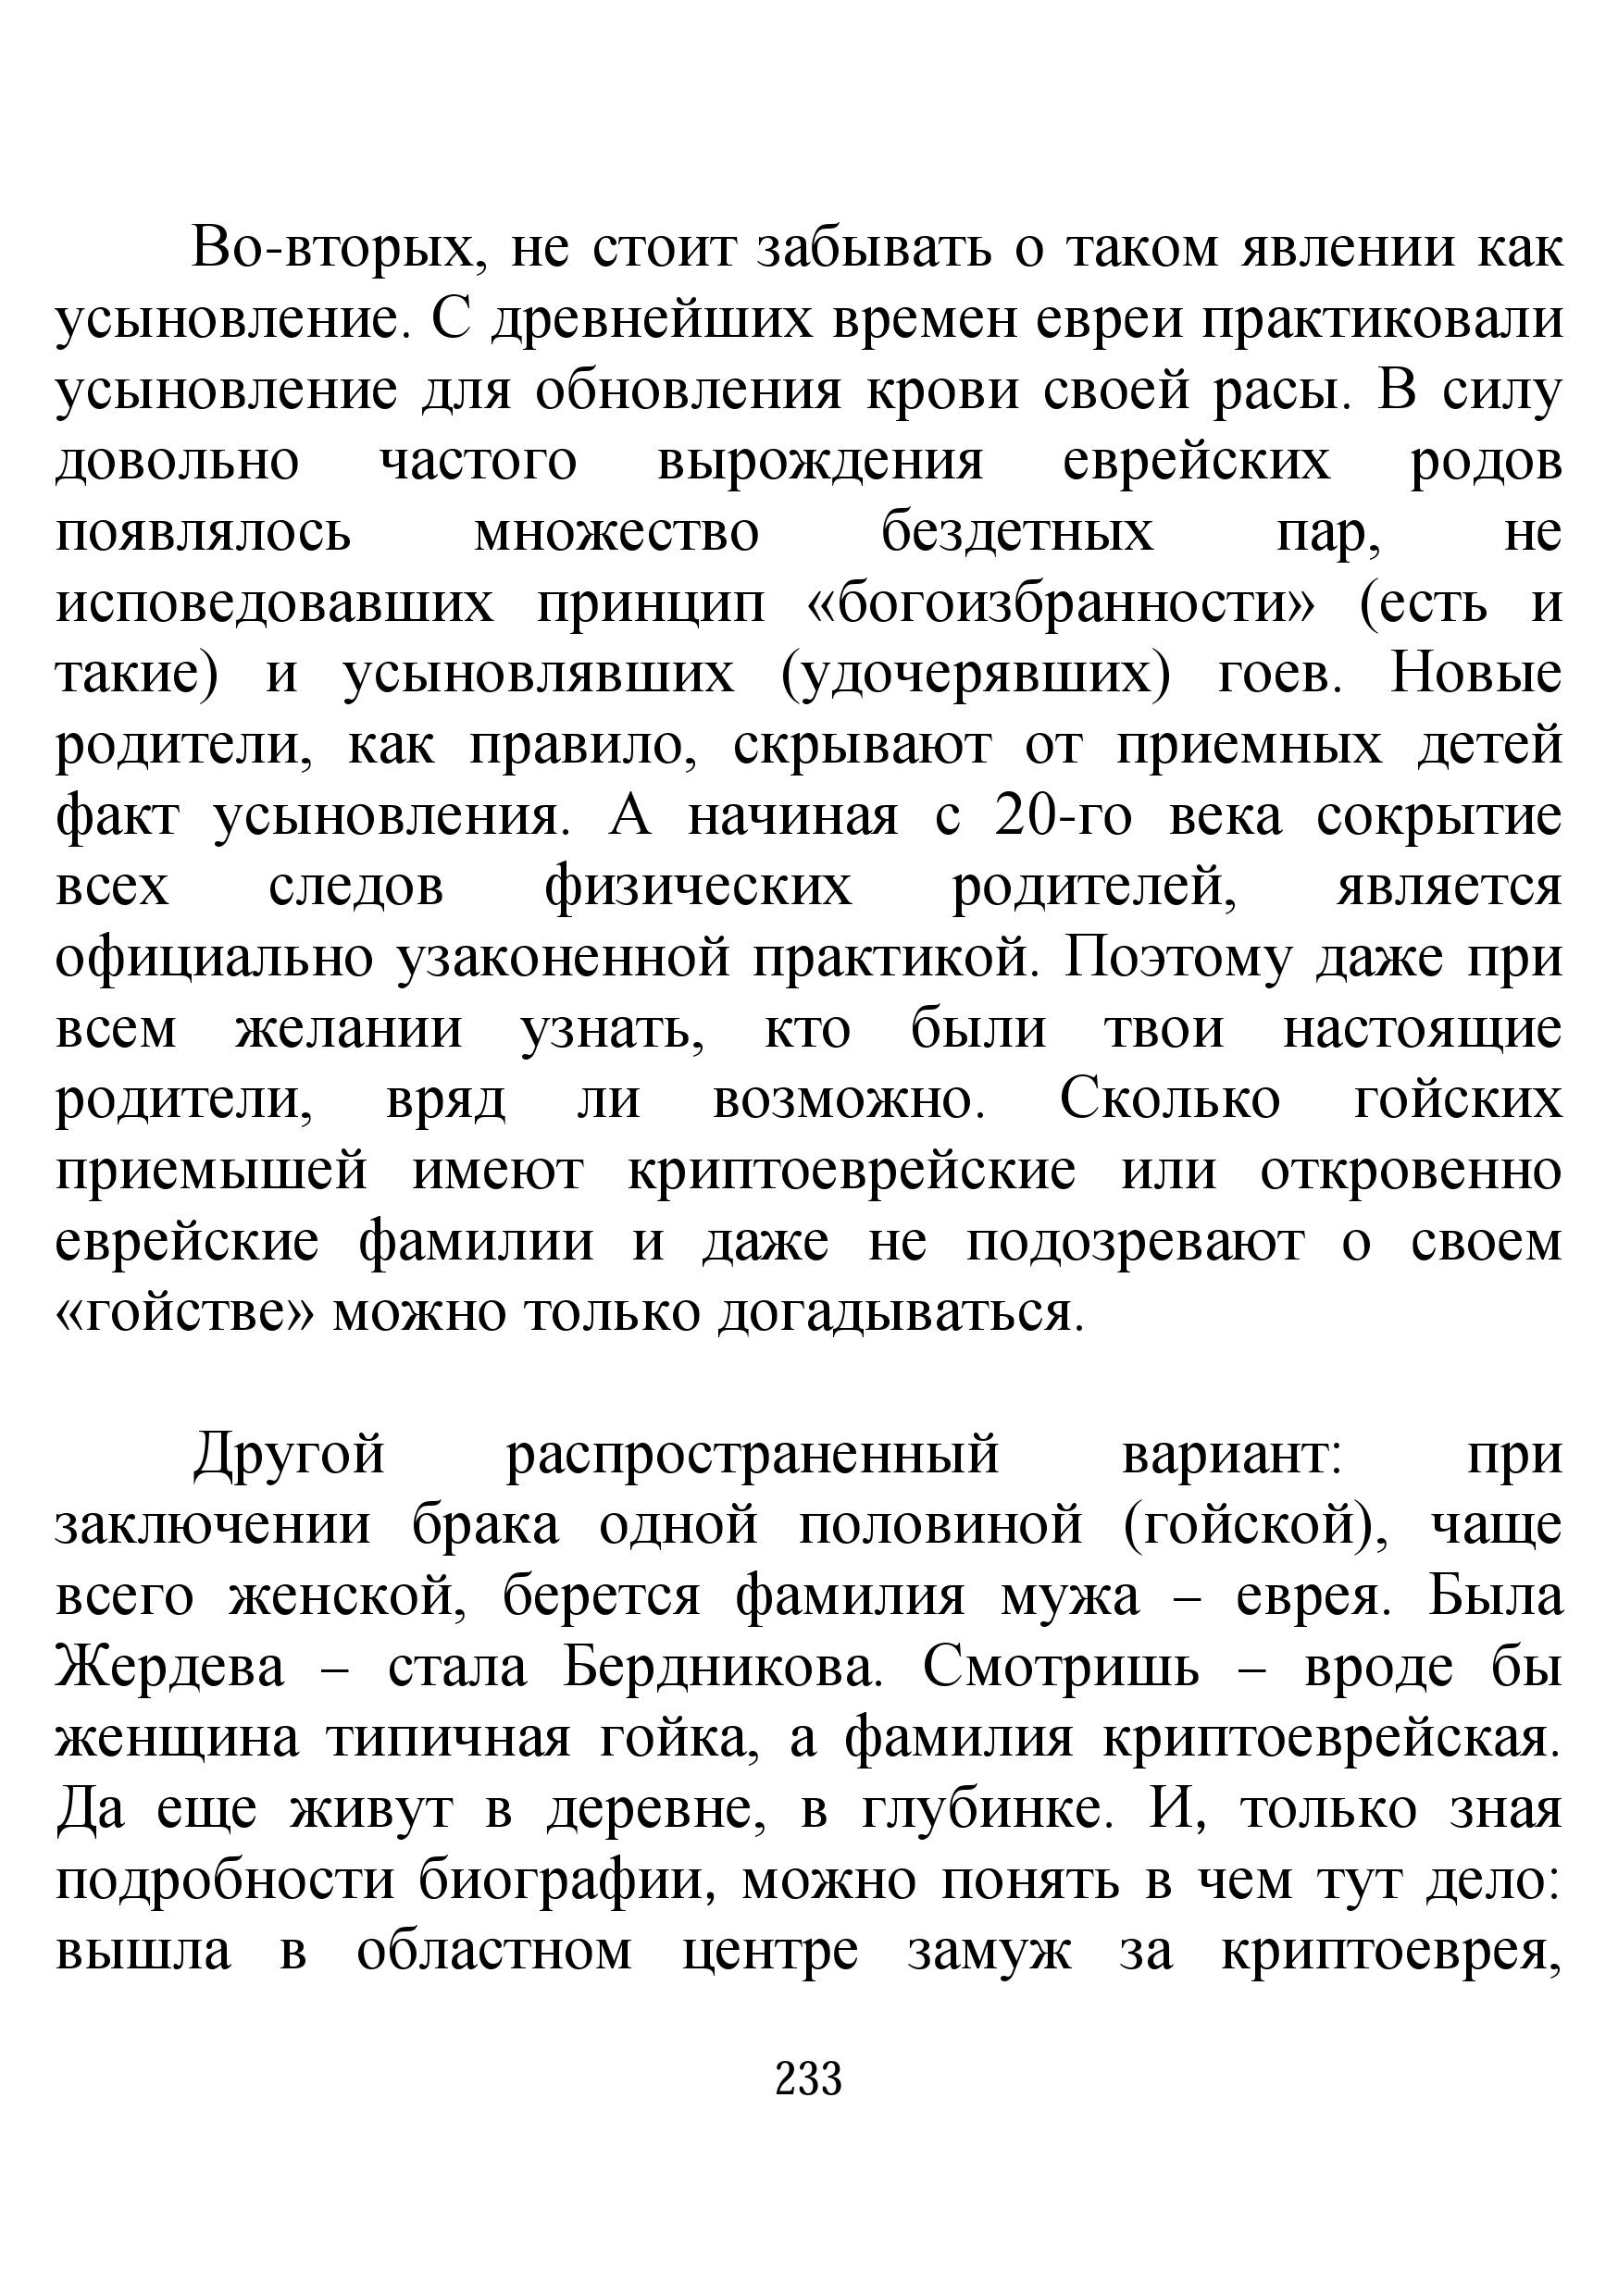 http://s2.uploads.ru/Dd8Wl.jpg